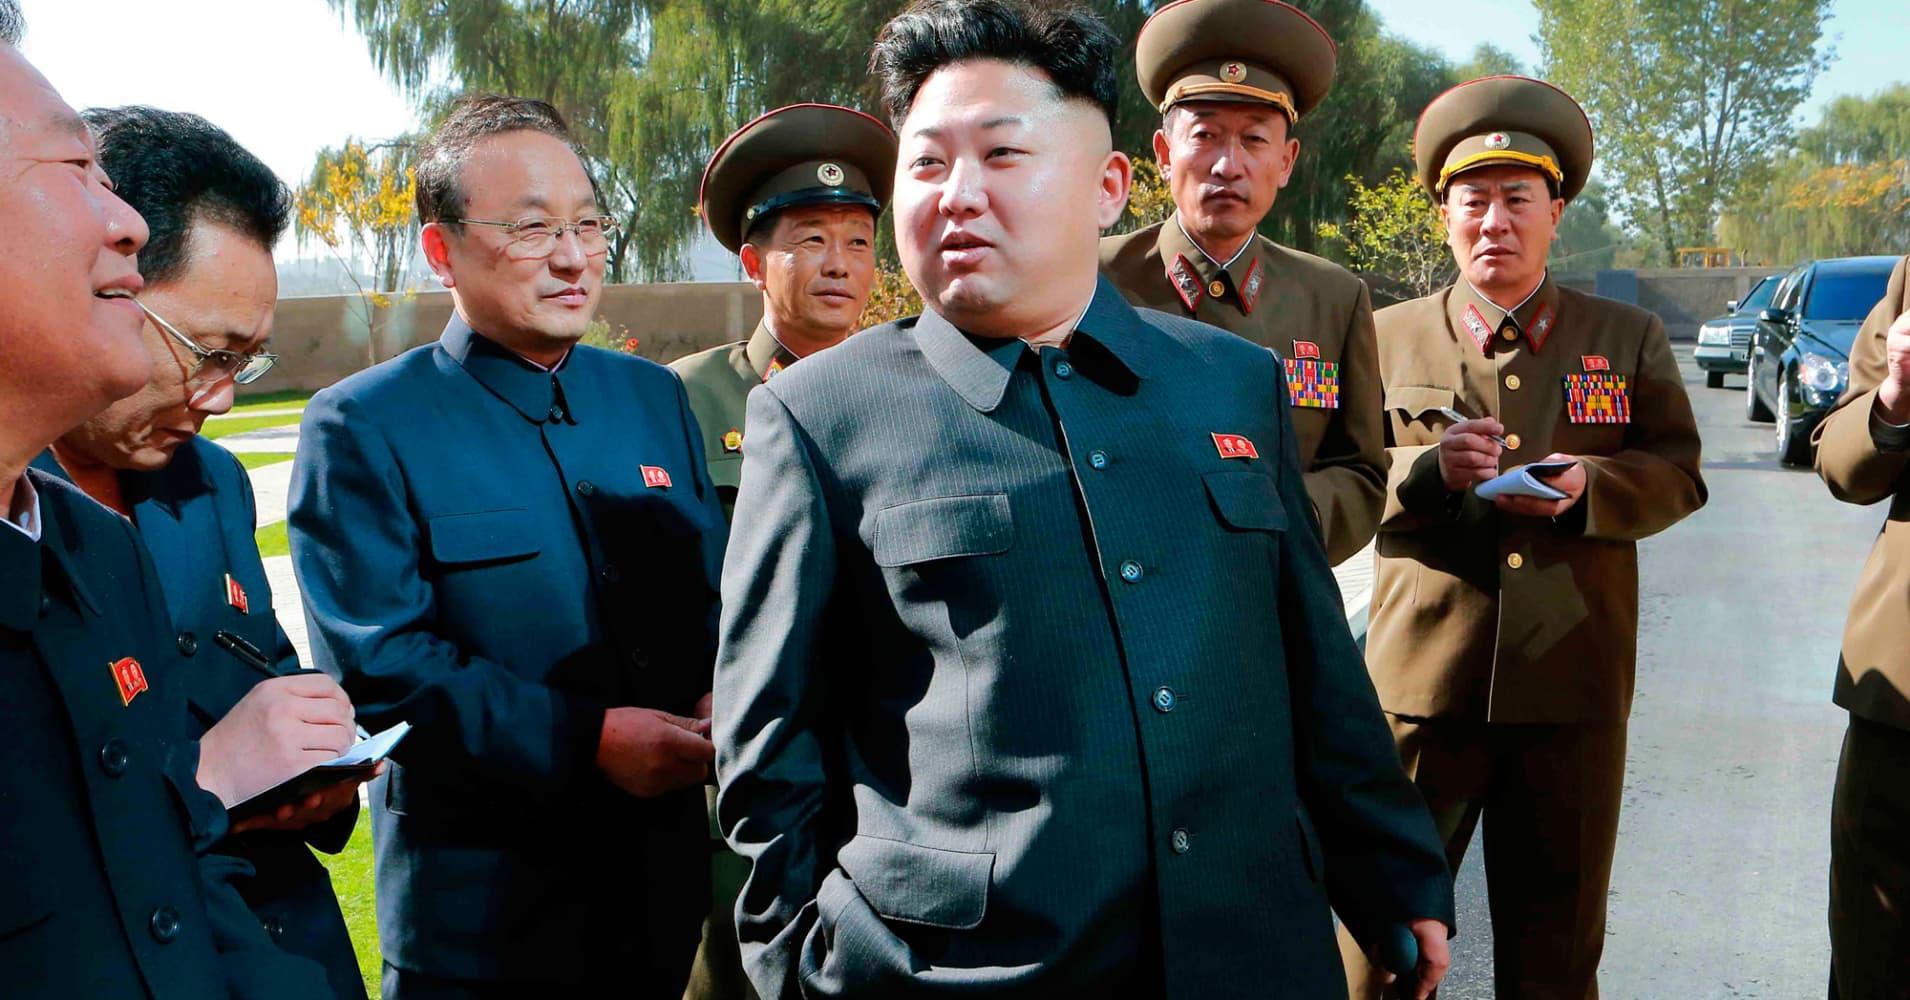 Kim's rocket stars - The trio behind North Korea's missile program